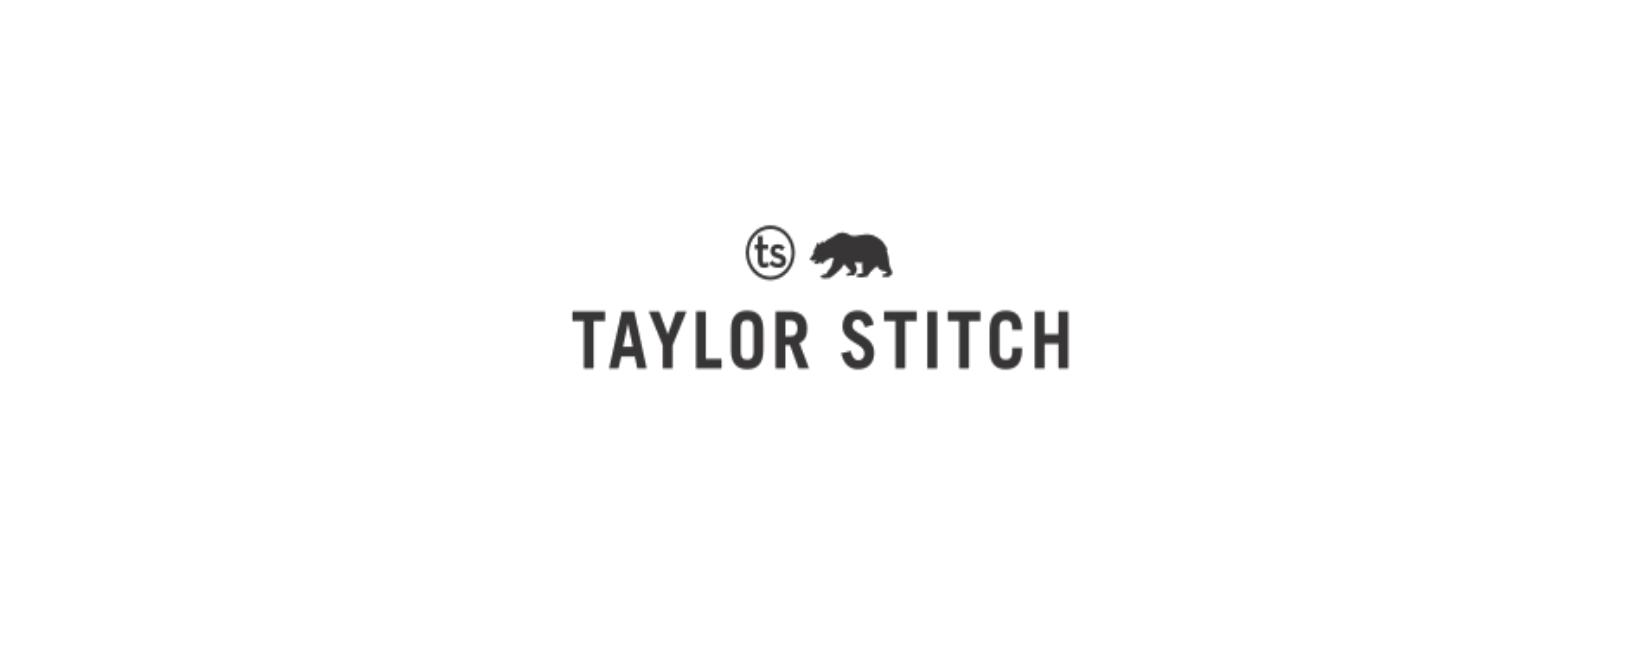 taylorstitch Discount Code 2021